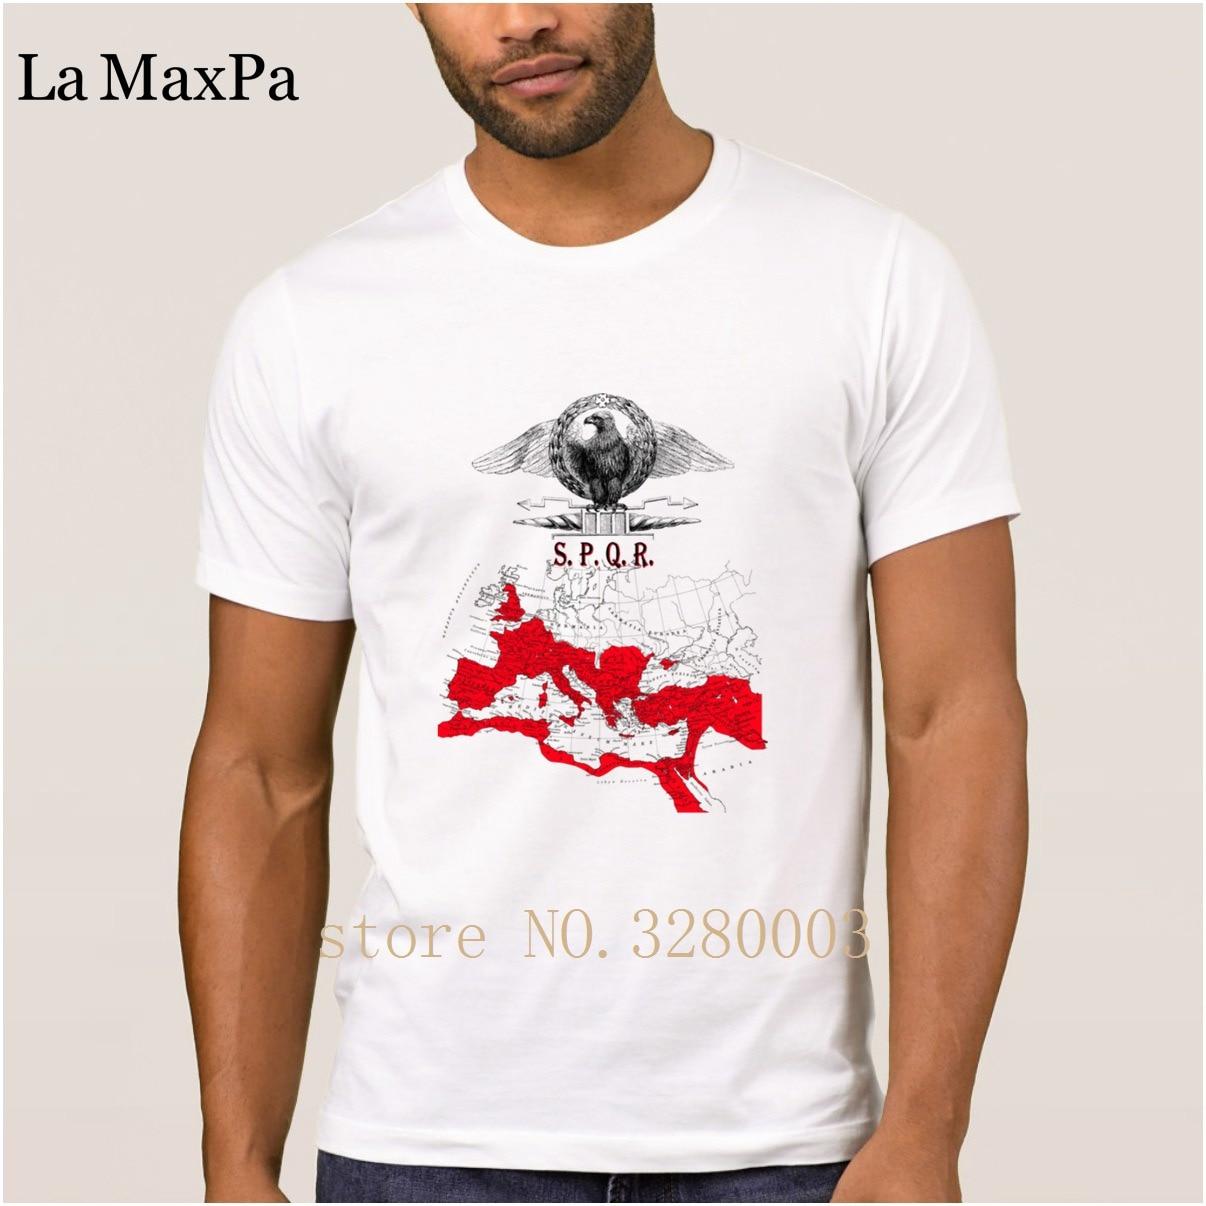 New Fashion T Shirt Men Spqr Banner With Detailed Map Of The Roman Empire Men T-shirt Summer Style Letter Tee Shirt Man